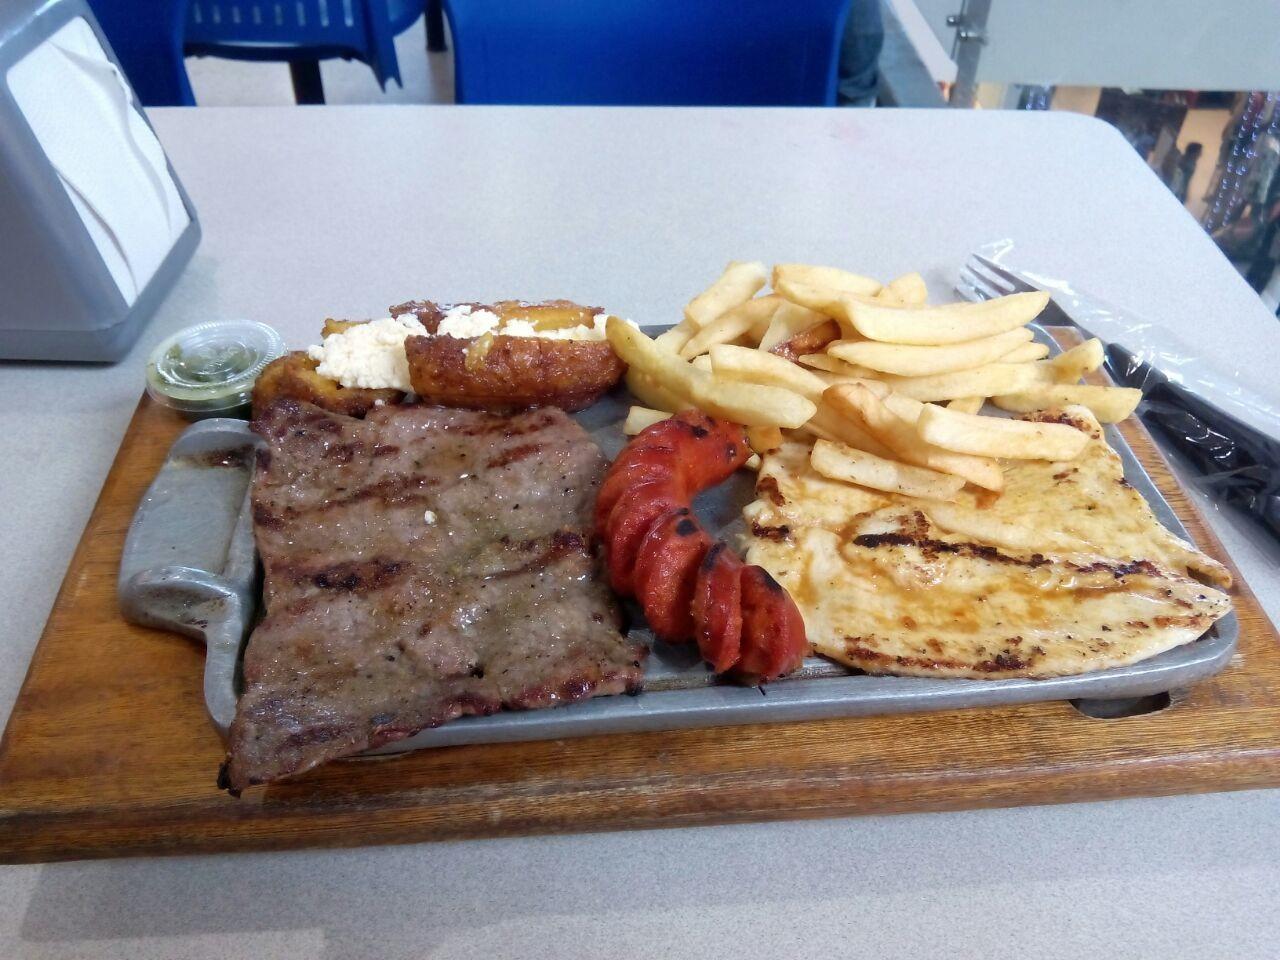 mas-comida-colombia-0a5b209f24733391c875